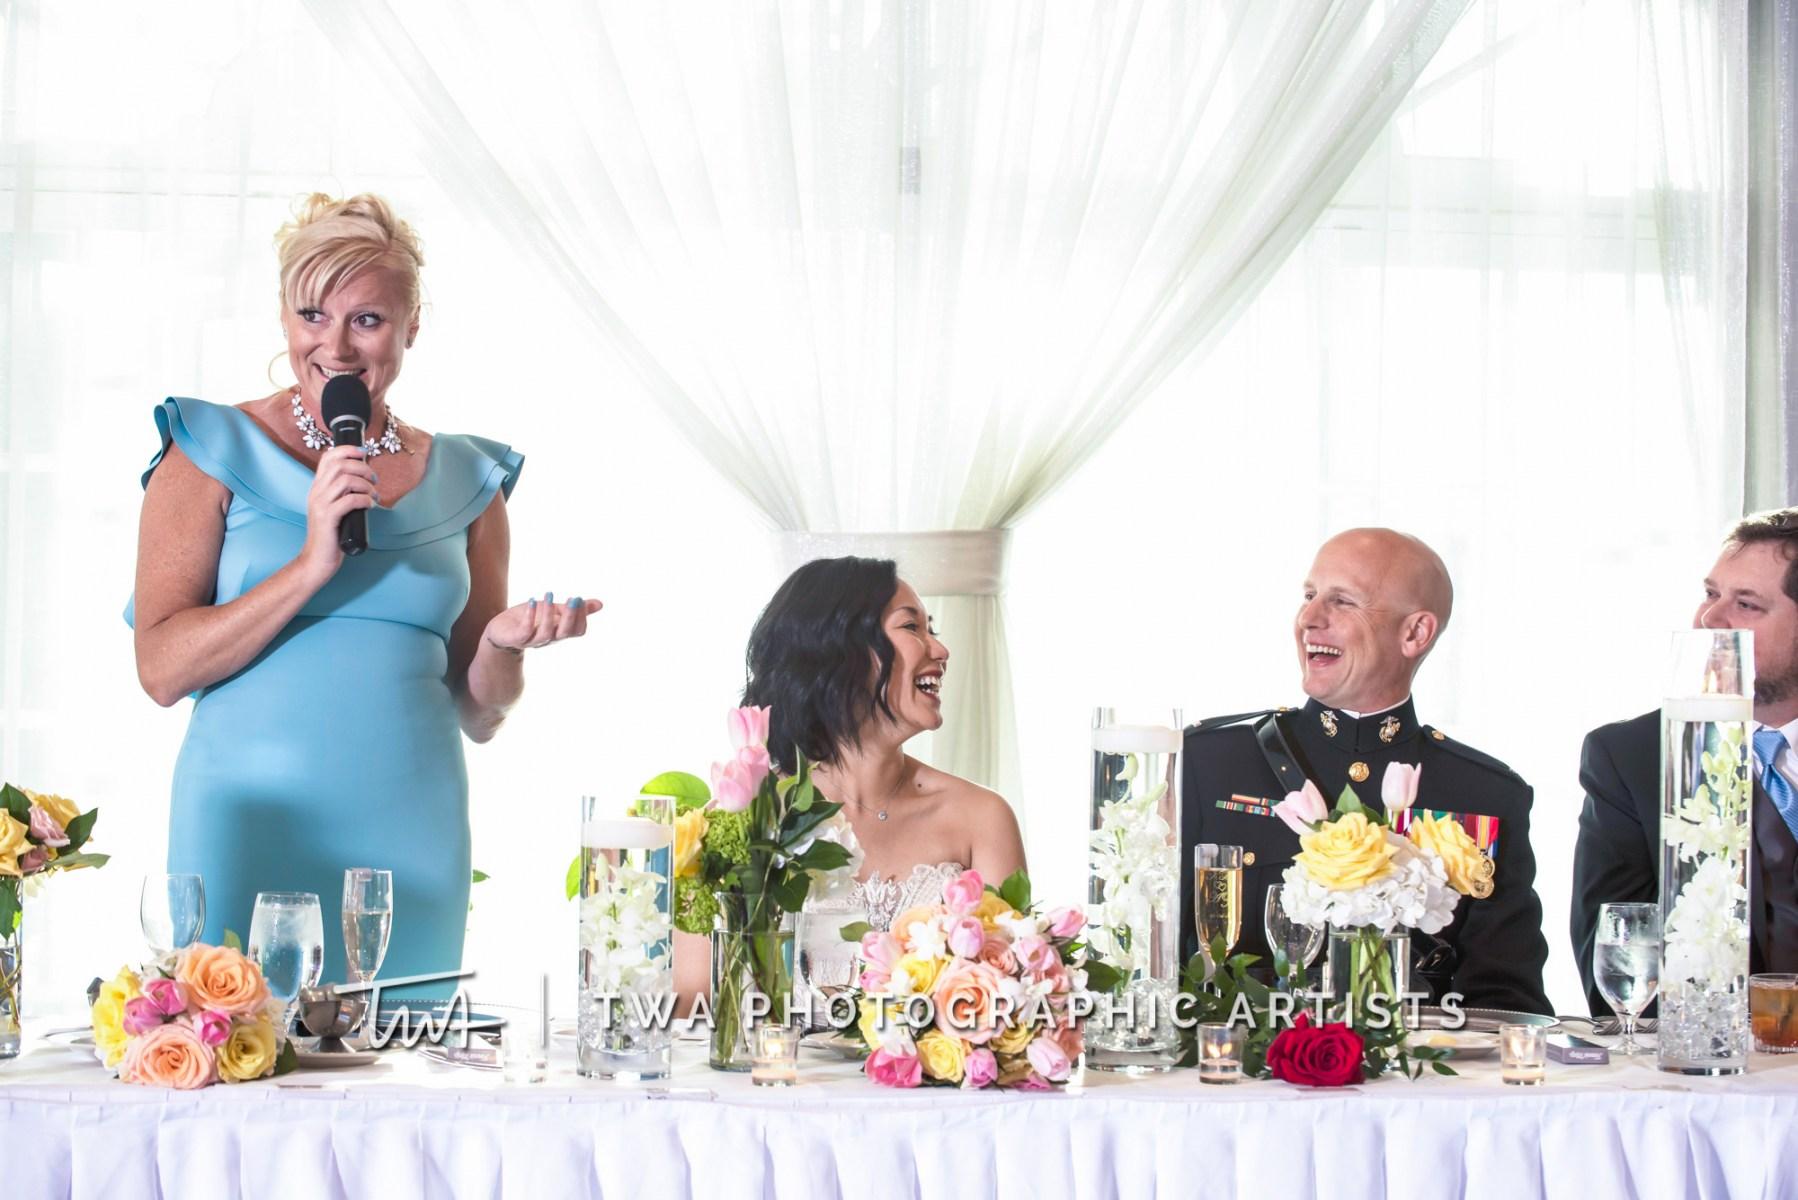 Chicago-Wedding-Photographer-TWA-Photographic-Artists-Drake-Hotel_Bermas_Zweifel_JP_GP-0681